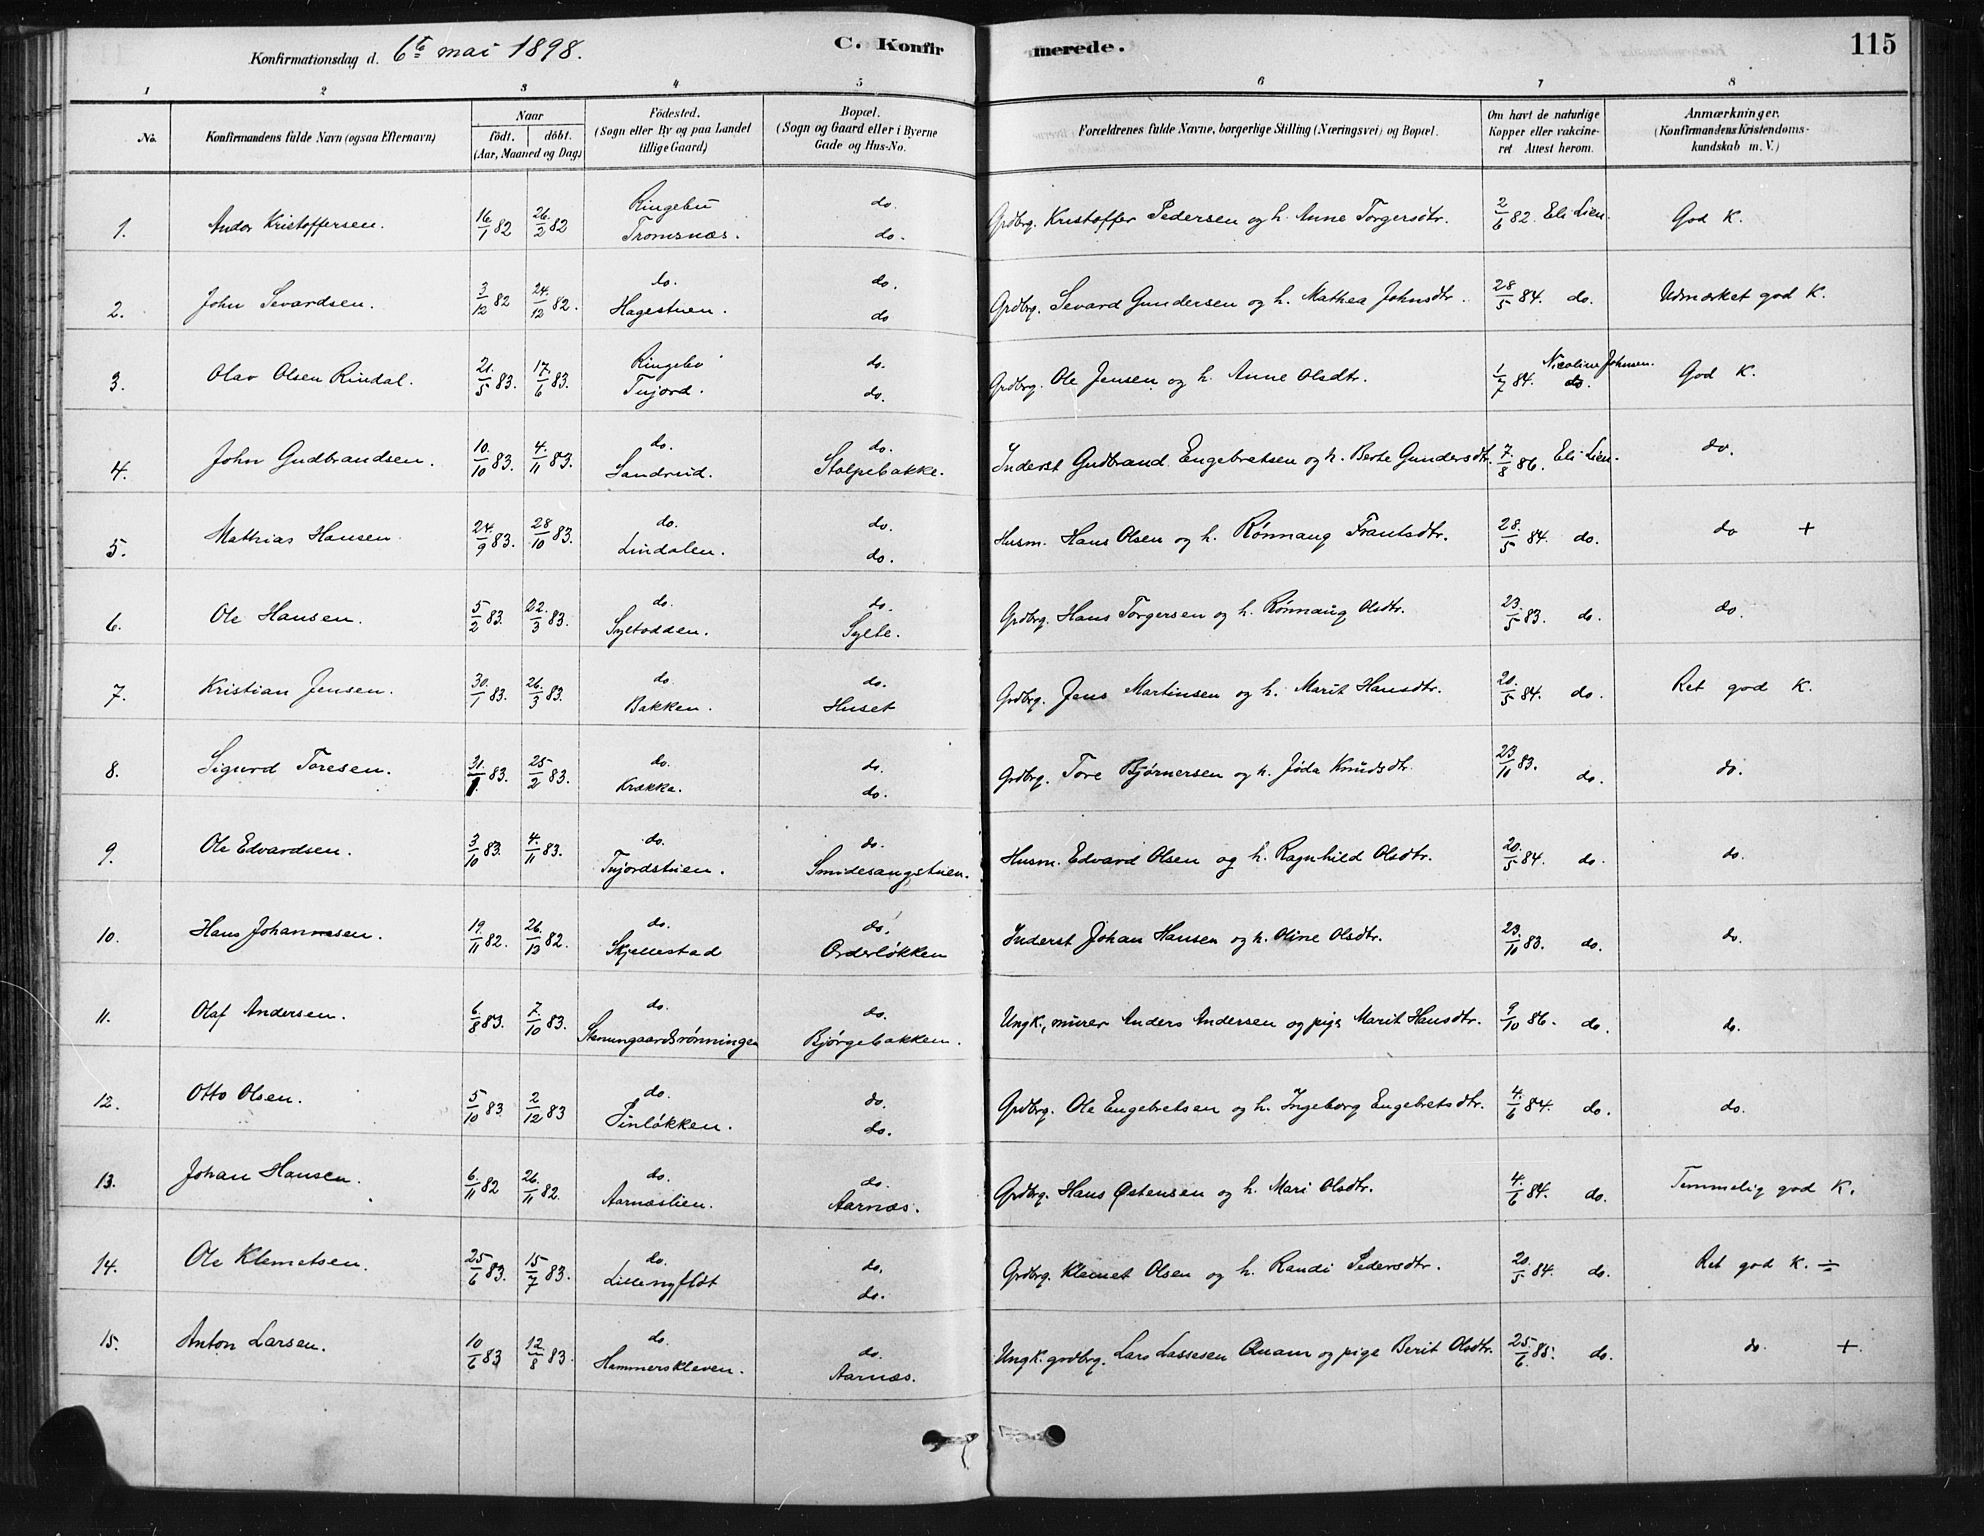 SAH, Ringebu prestekontor, Ministerialbok nr. 9, 1878-1898, s. 115